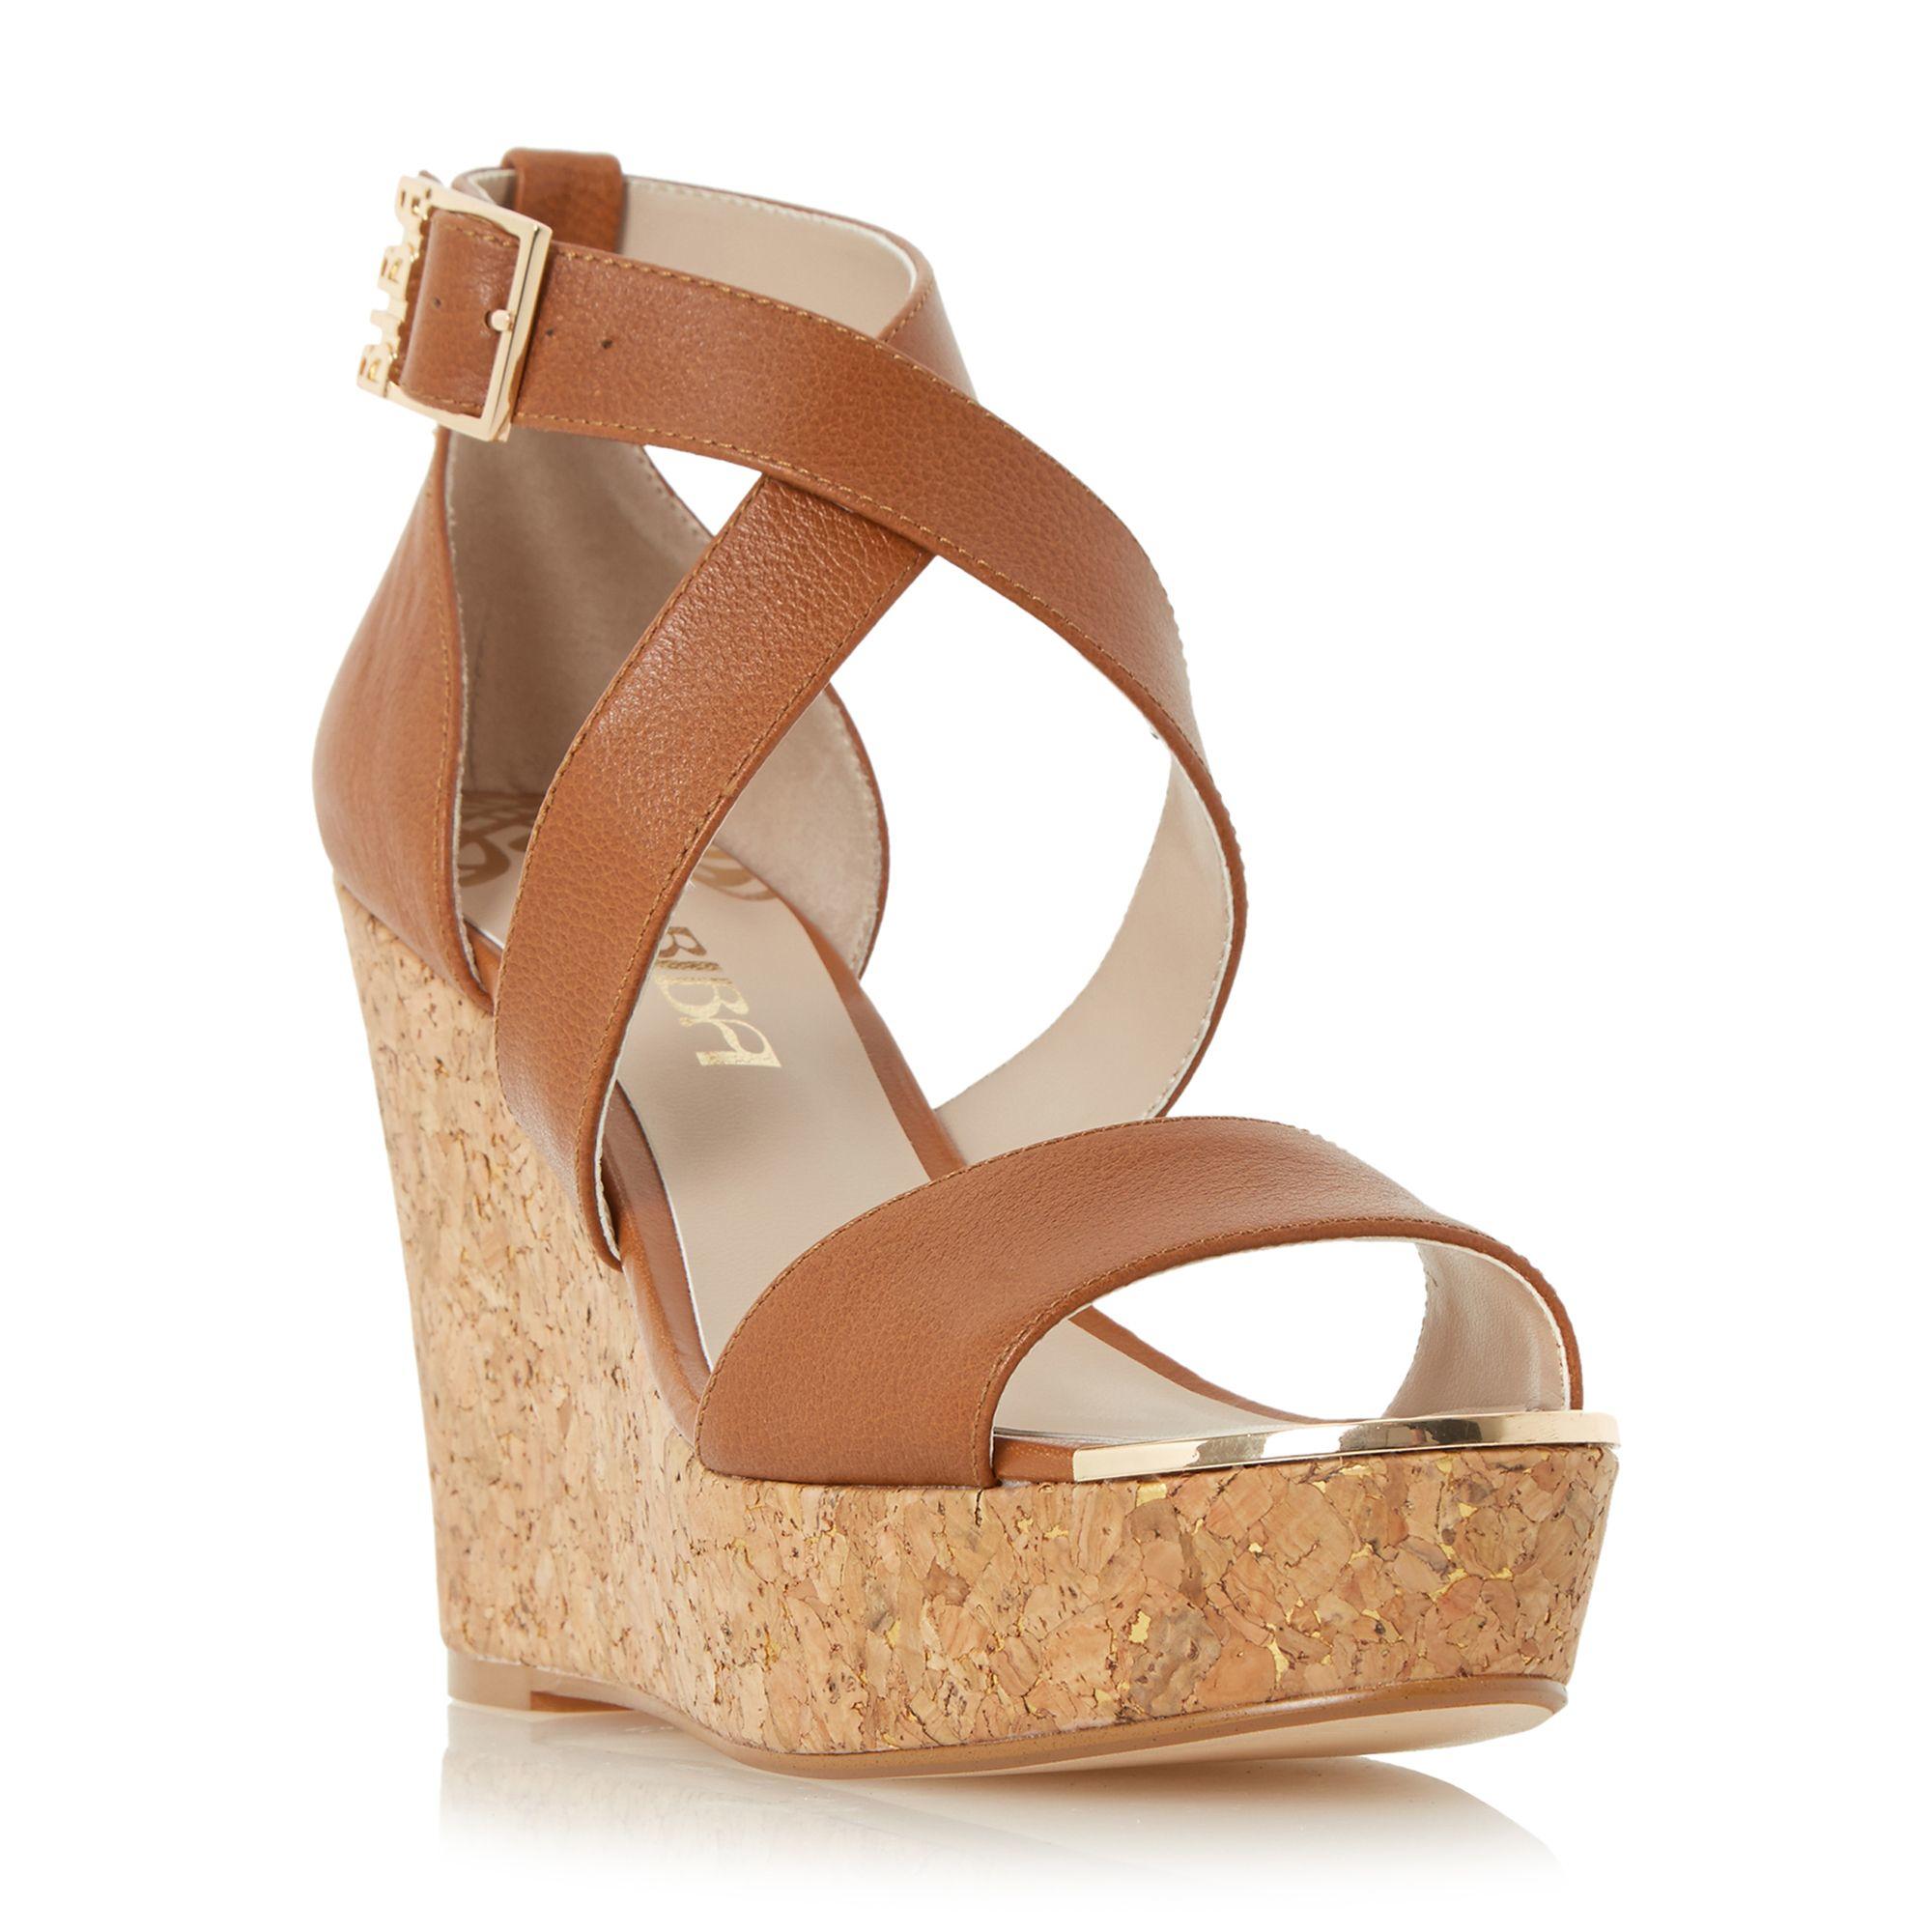 biba kanya wedge sandals in brown lyst